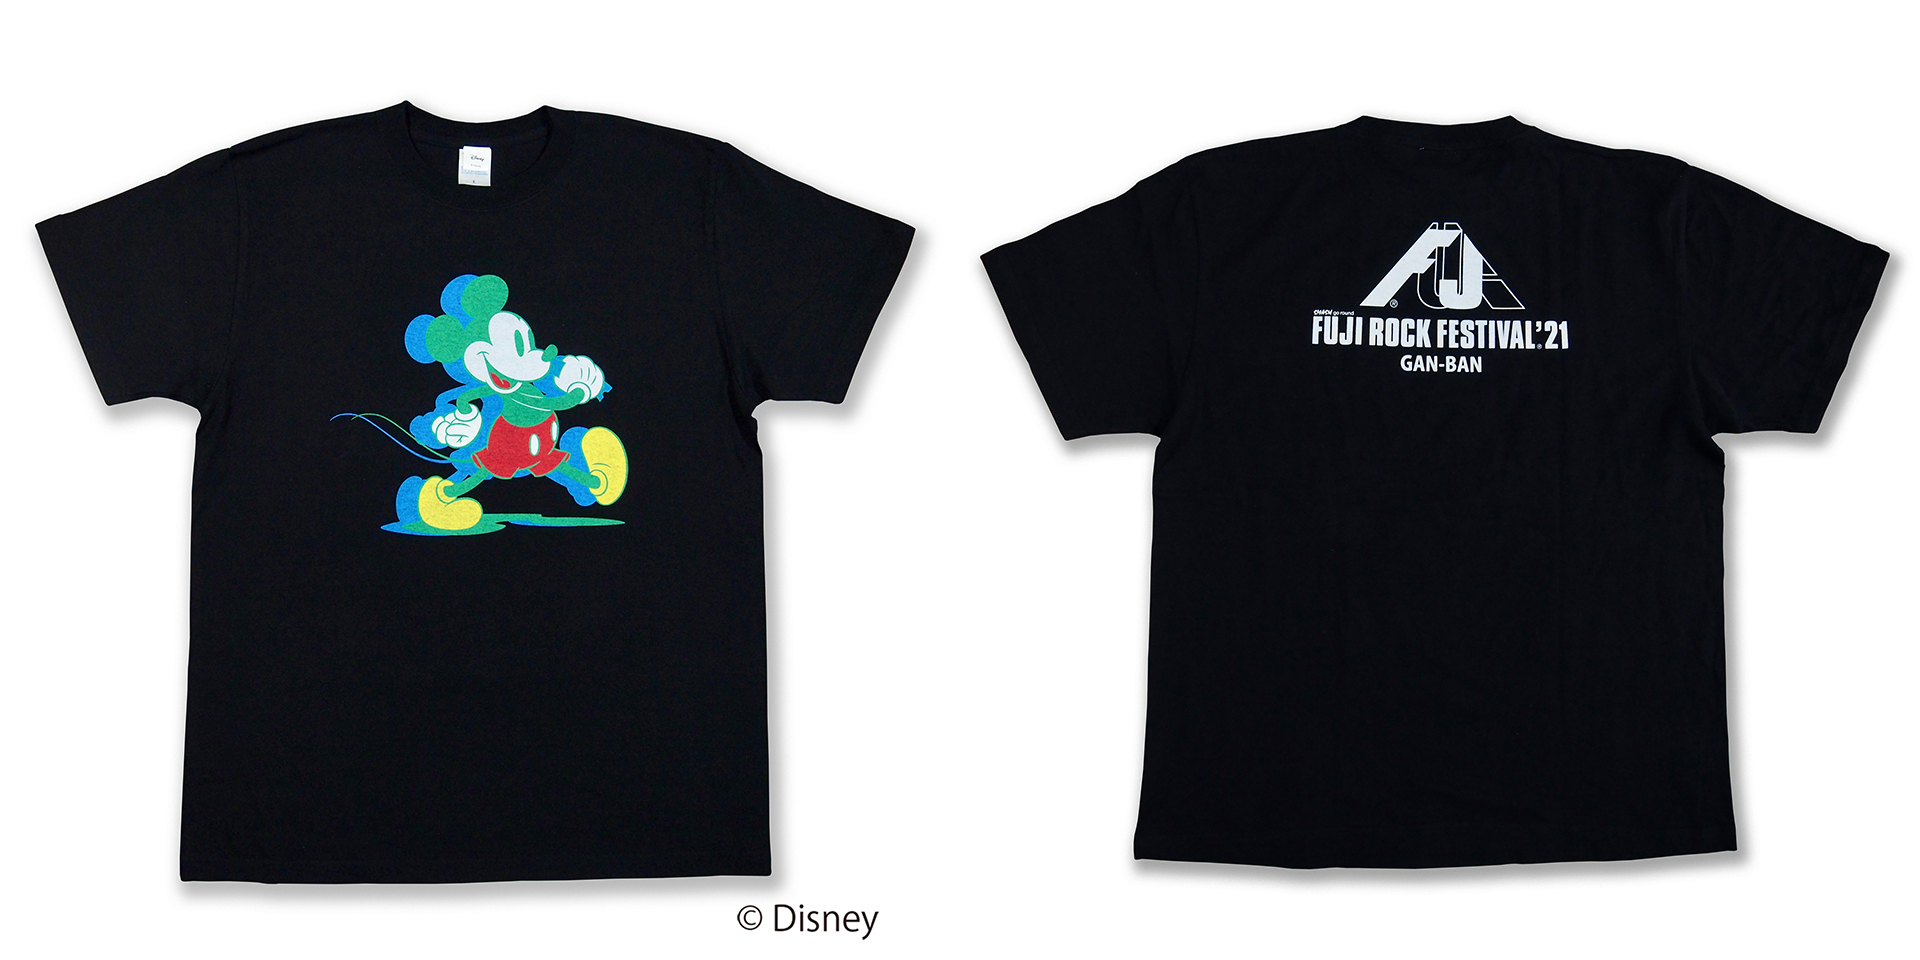 210521_news_ganbangood02_06 フジロック'21×GAN-BANコラボTシャツが一挙発売!人気キャラクターが勢揃い #fujirock